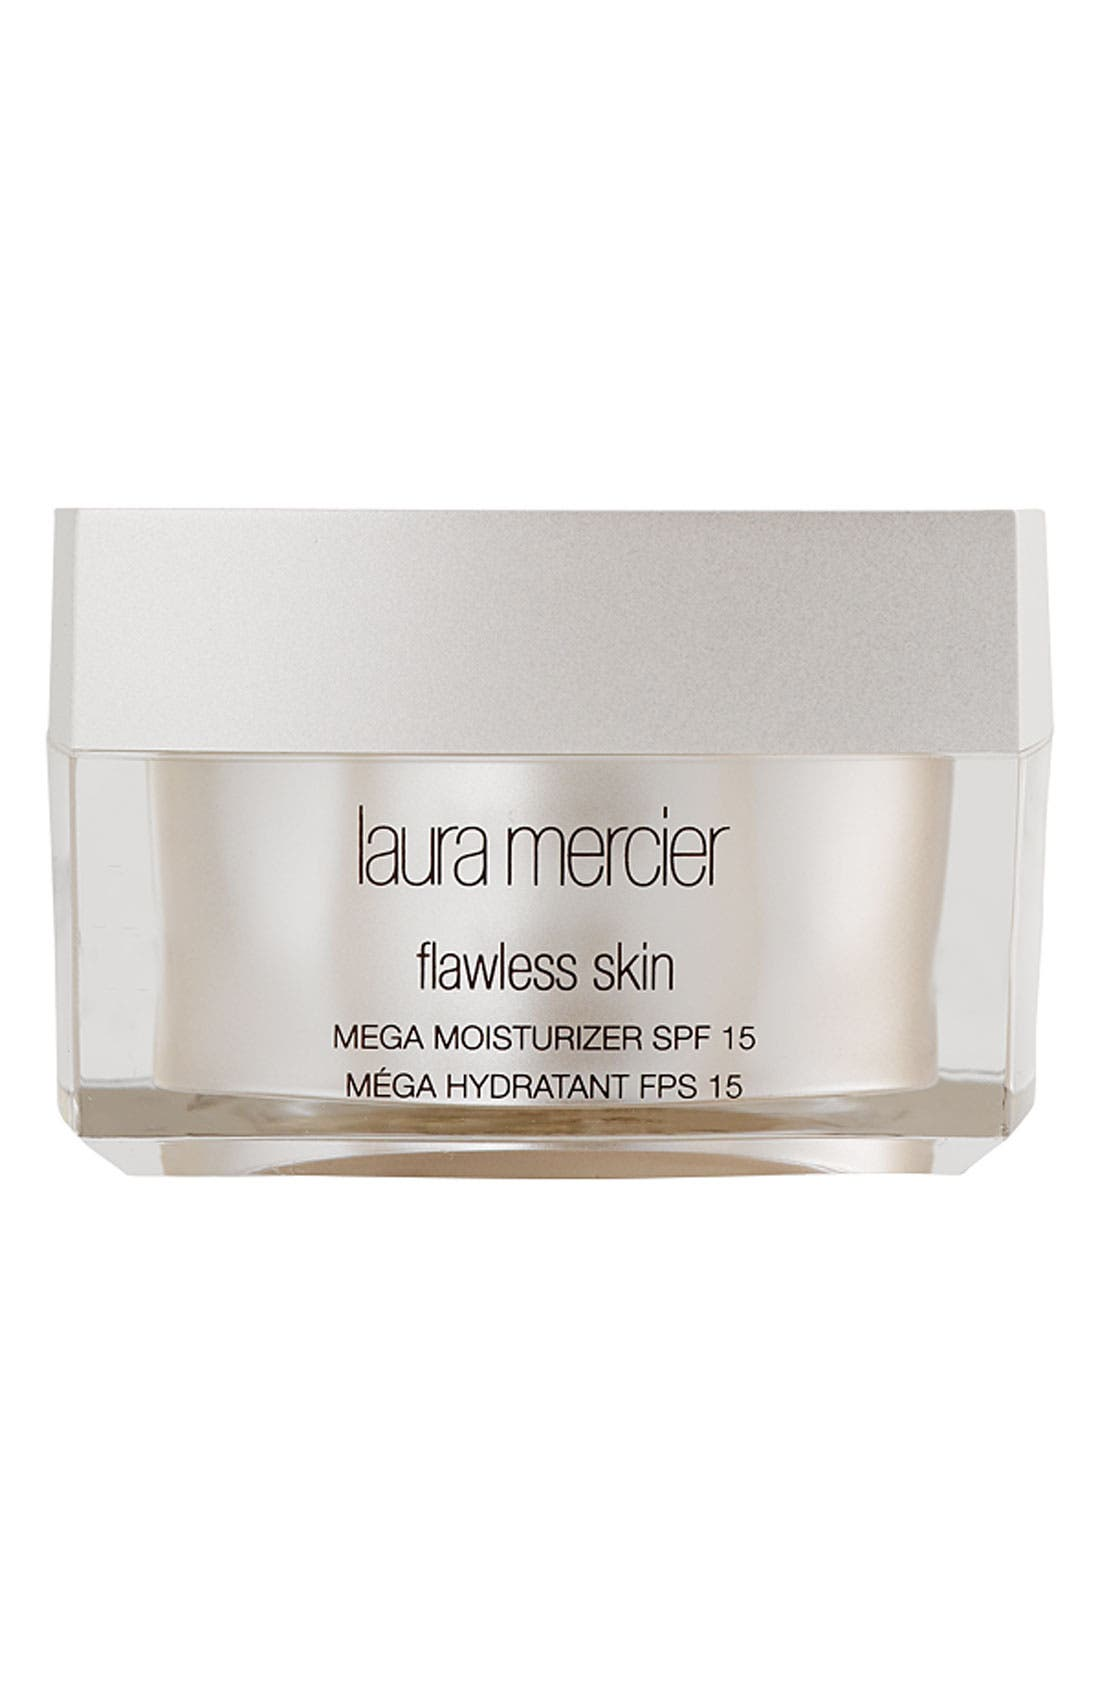 'Flawless Skin' Mega Moisturizer SPF 15 for Normal/Dry Skin,                             Main thumbnail 1, color,                             NO COLOR